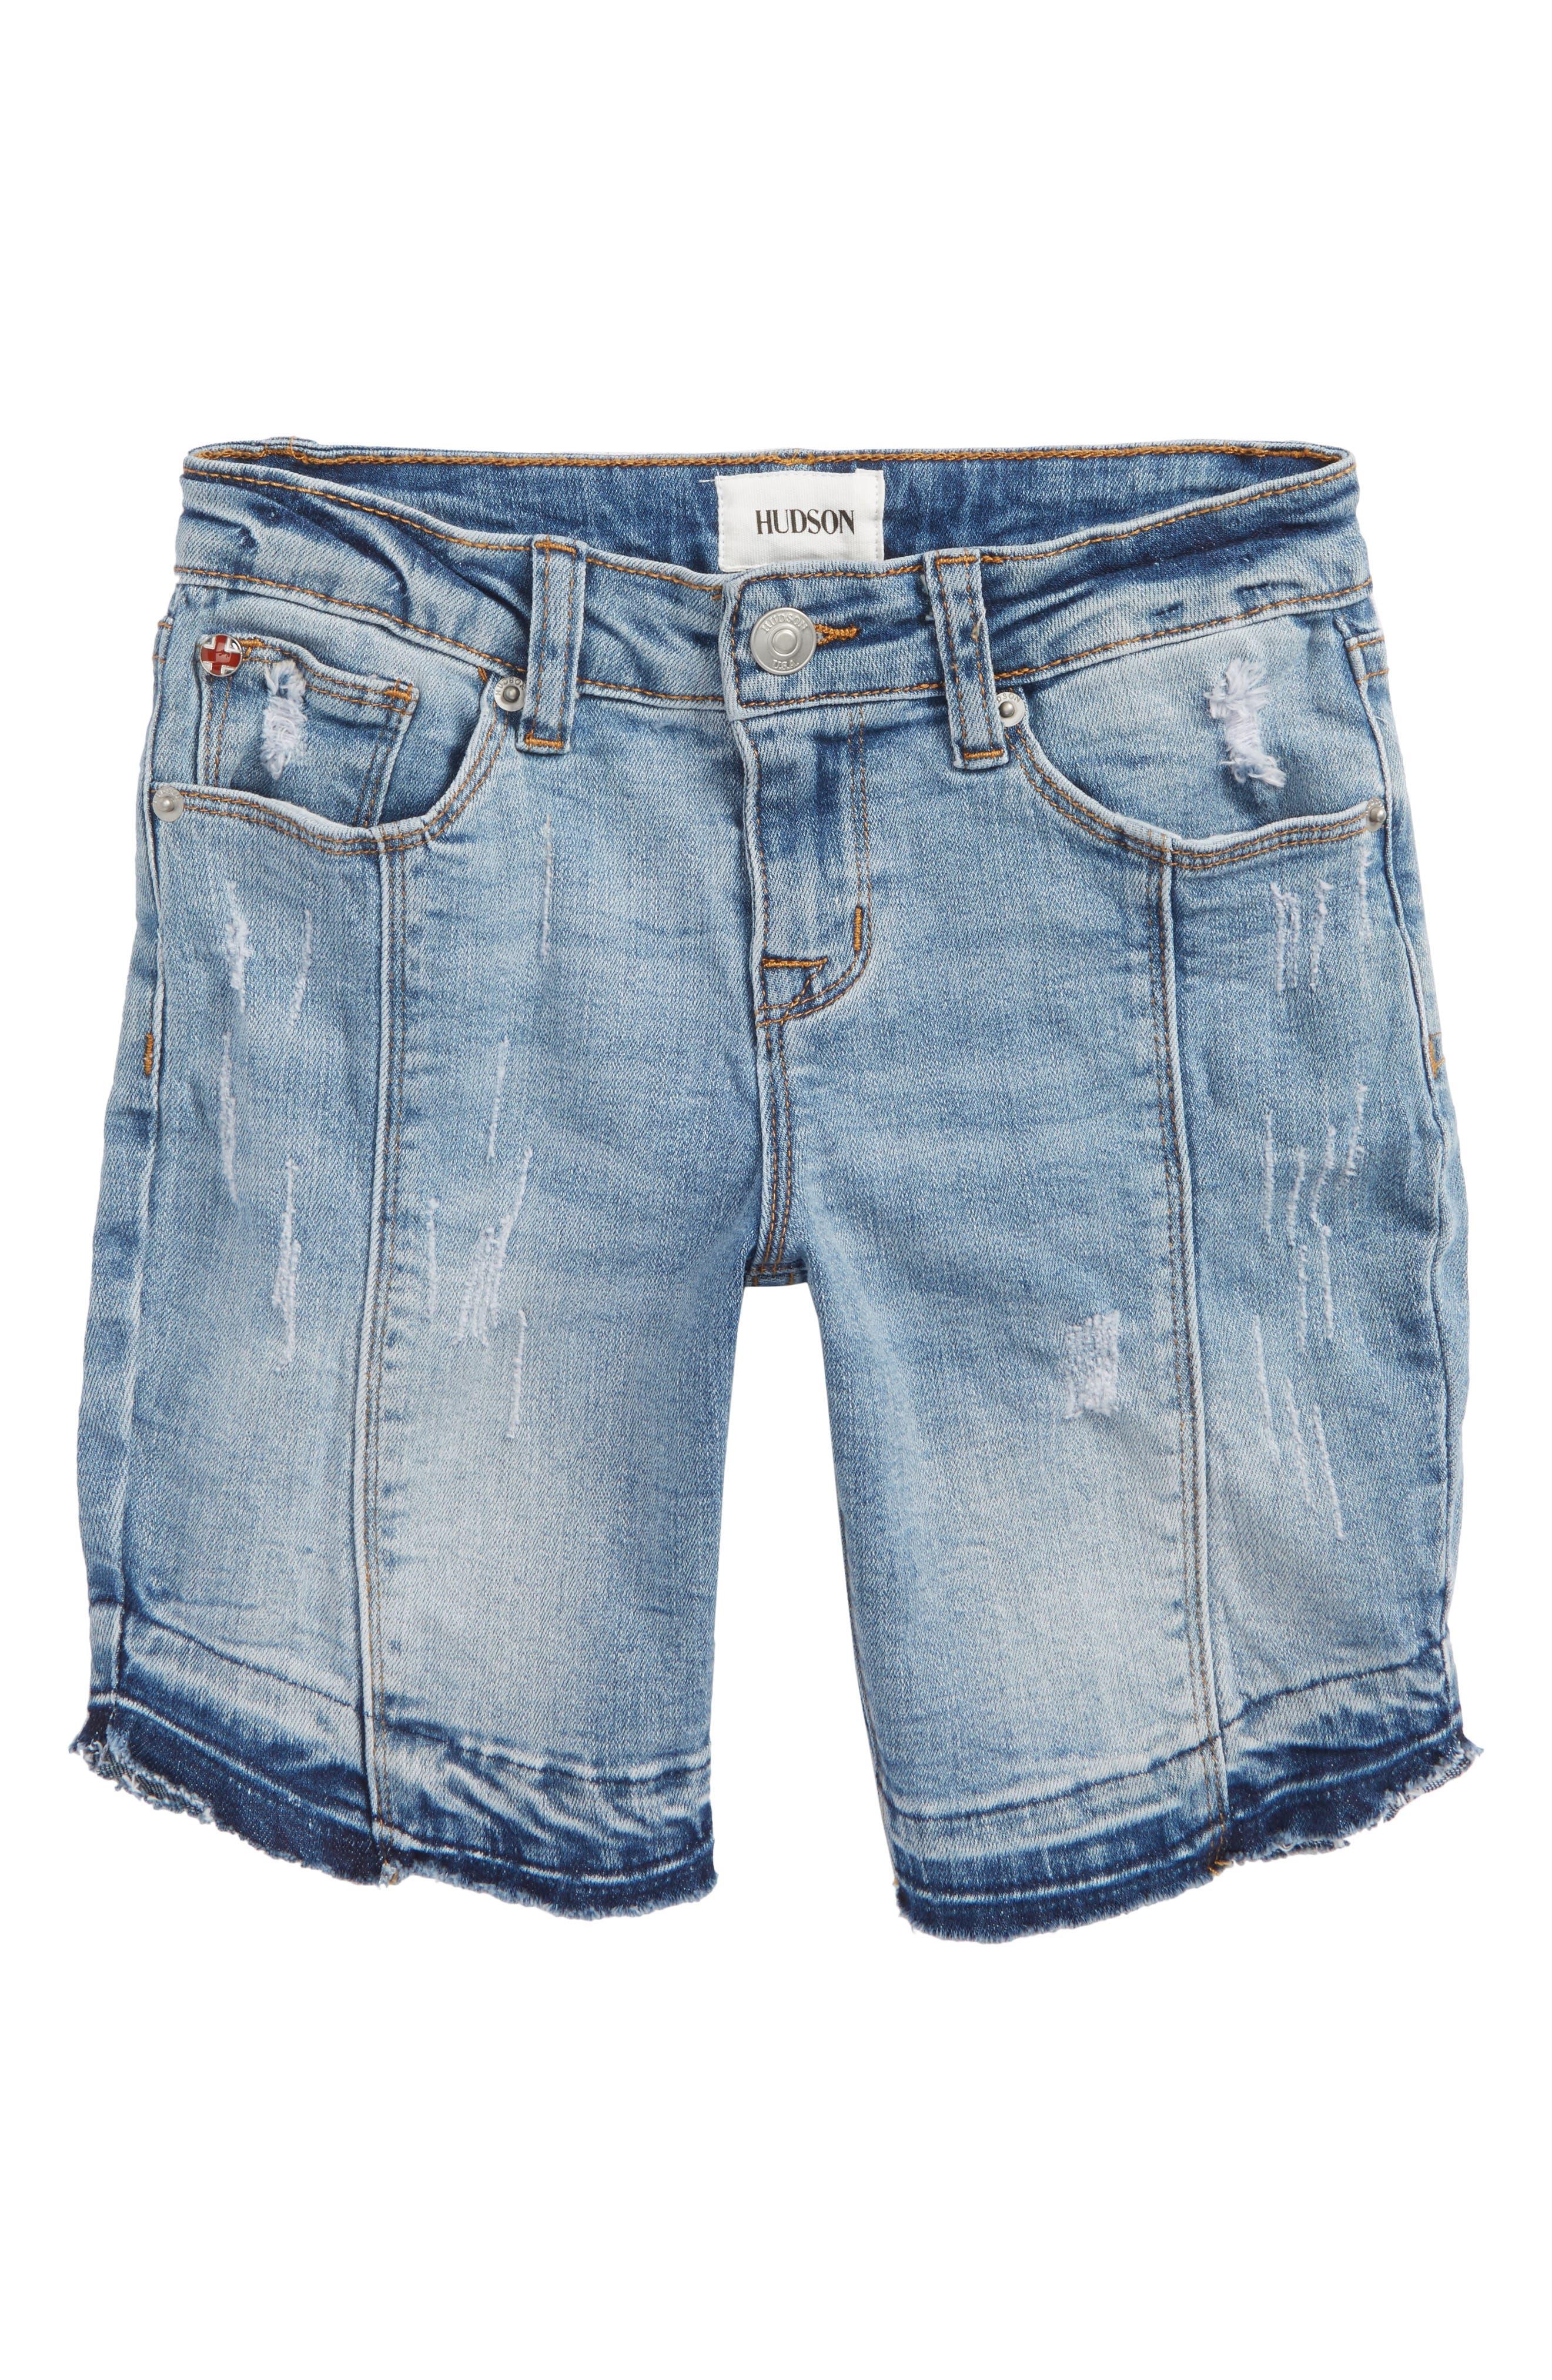 Release Hem Distressed Denim Shorts,                         Main,                         color, 400